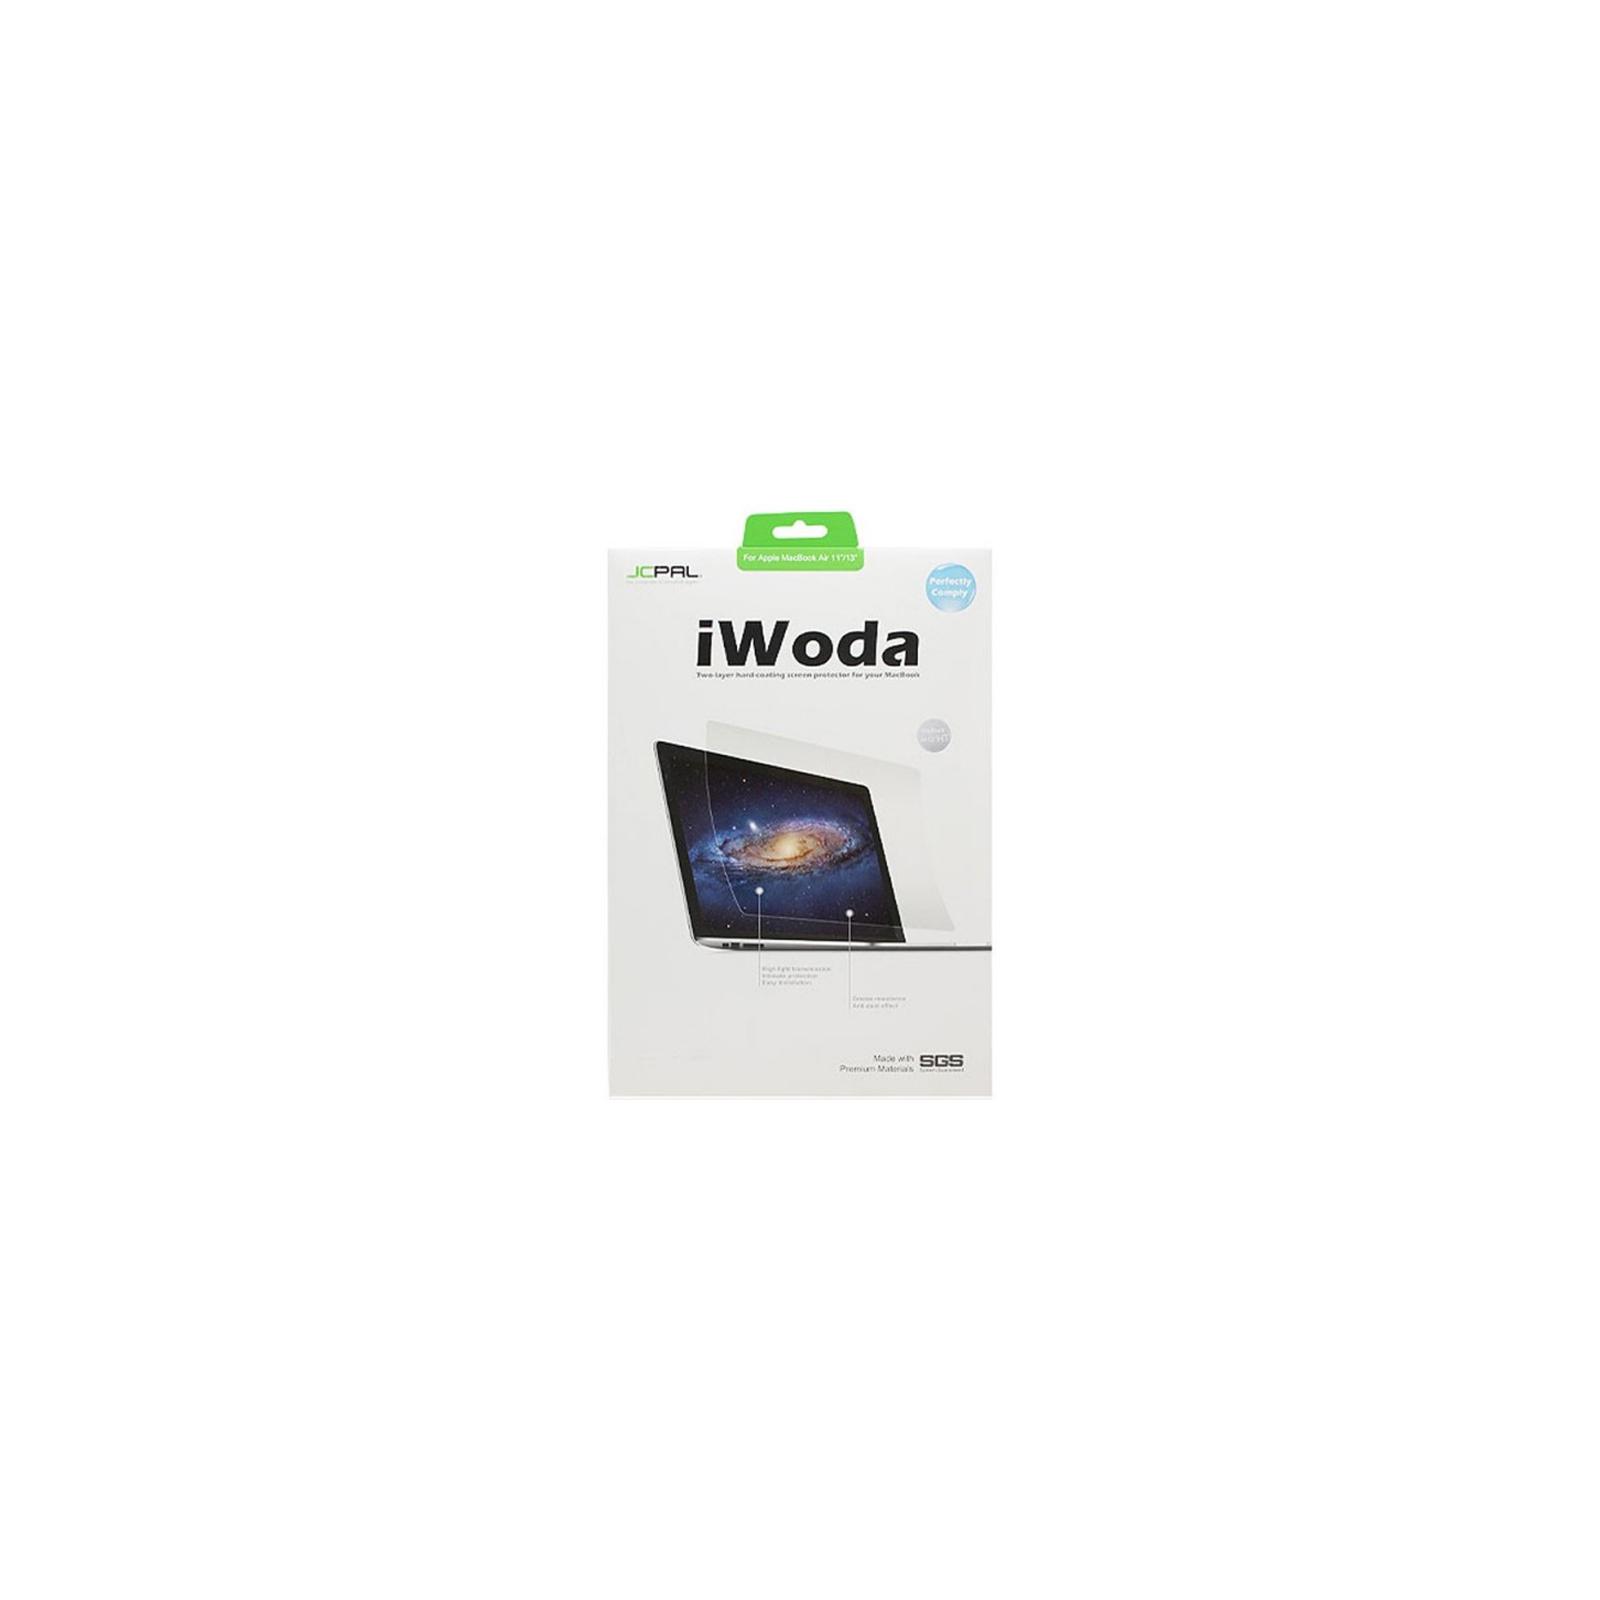 Пленка защитная JCPAL iWoda для MacBook Air 13 (High Transparency) (JCP2010)